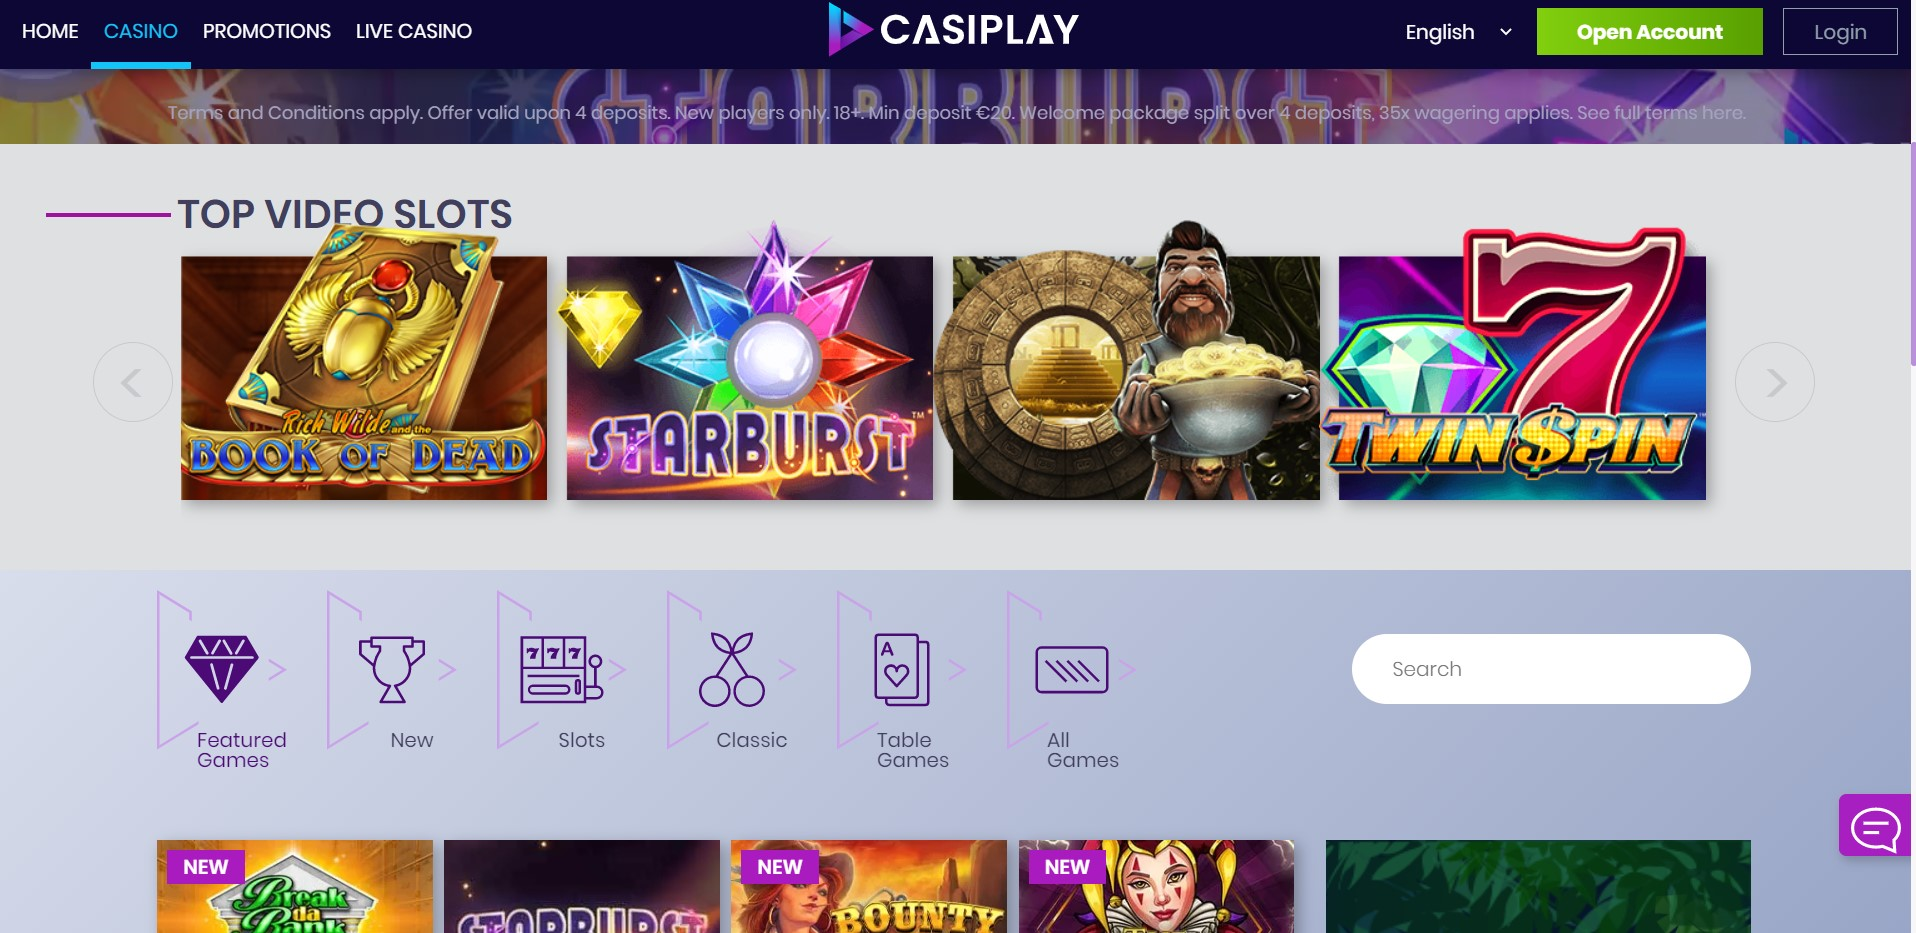 Casiplay casino slots